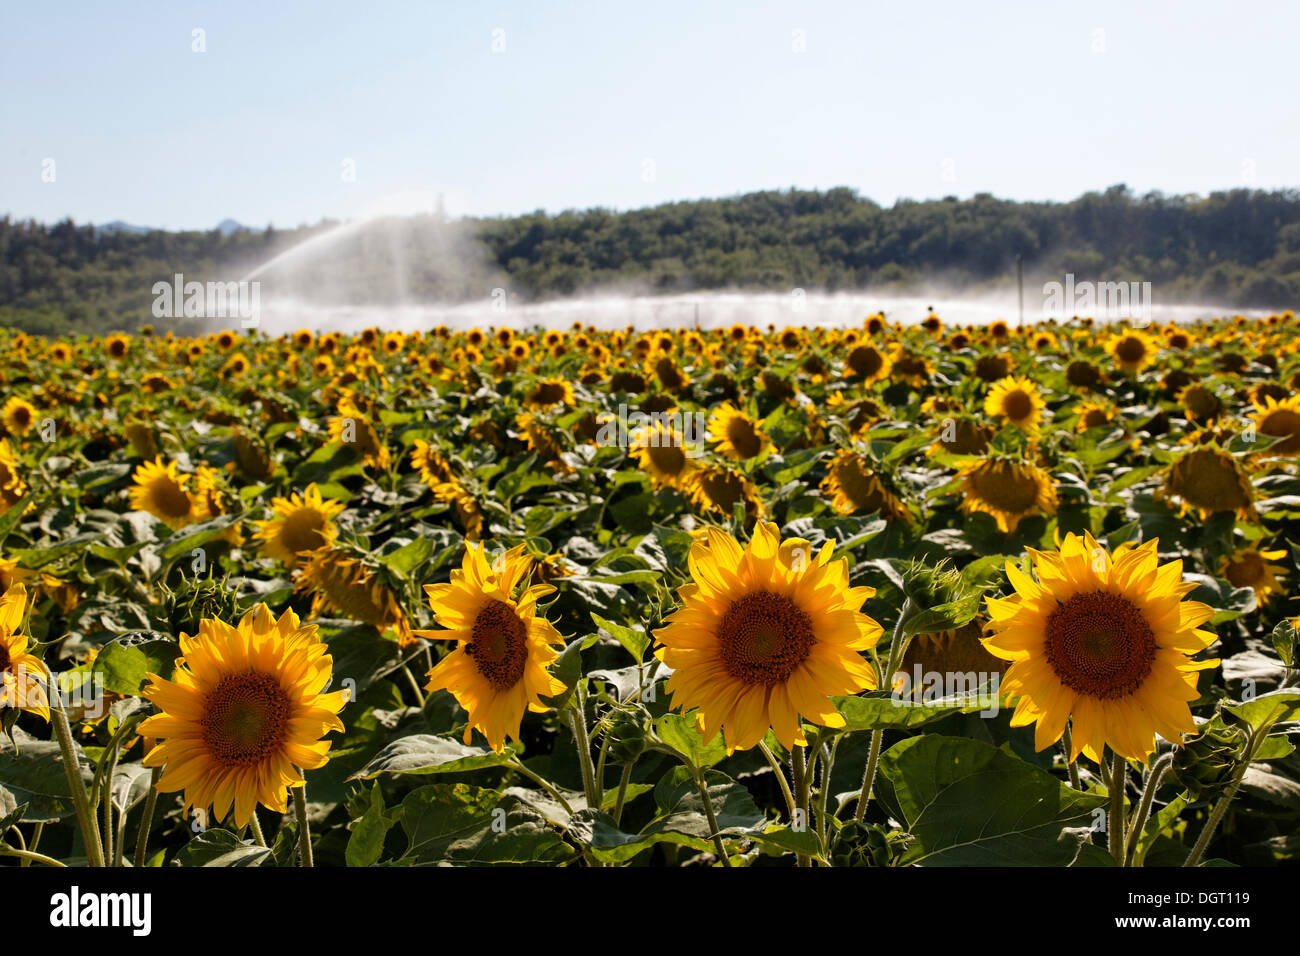 Sunflower field with irrigation, Sisteron, Provence region, Département Alpes-de-Haute-Provence, France, Europe - Stock Image